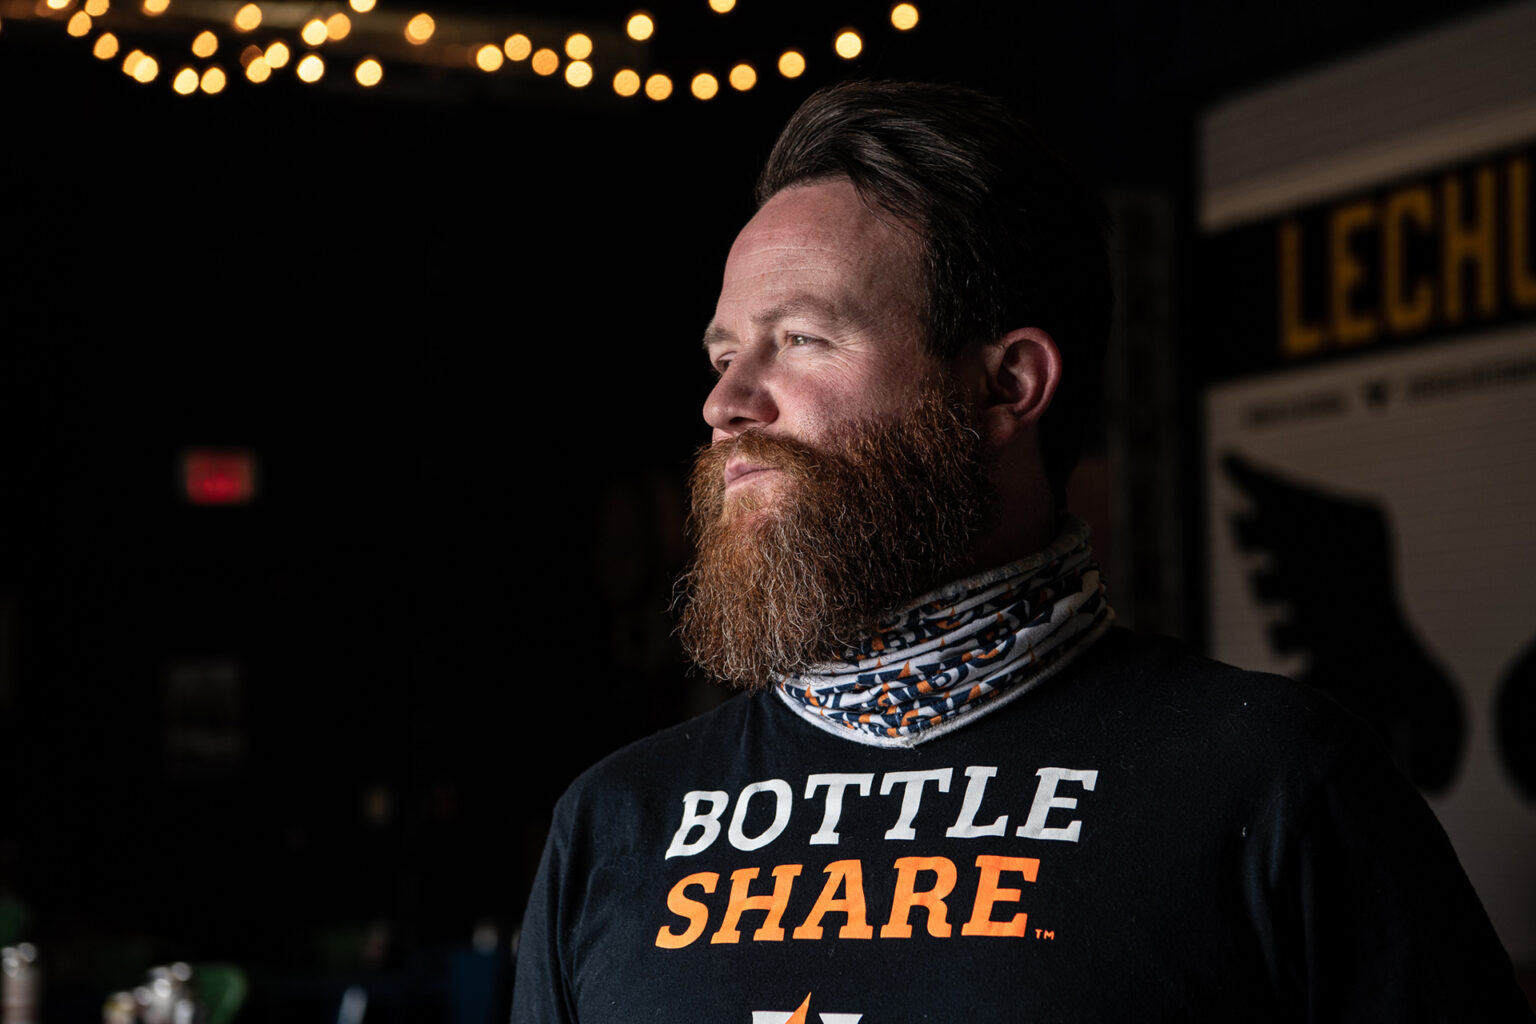 BottleShare craft beer nonprofit branding